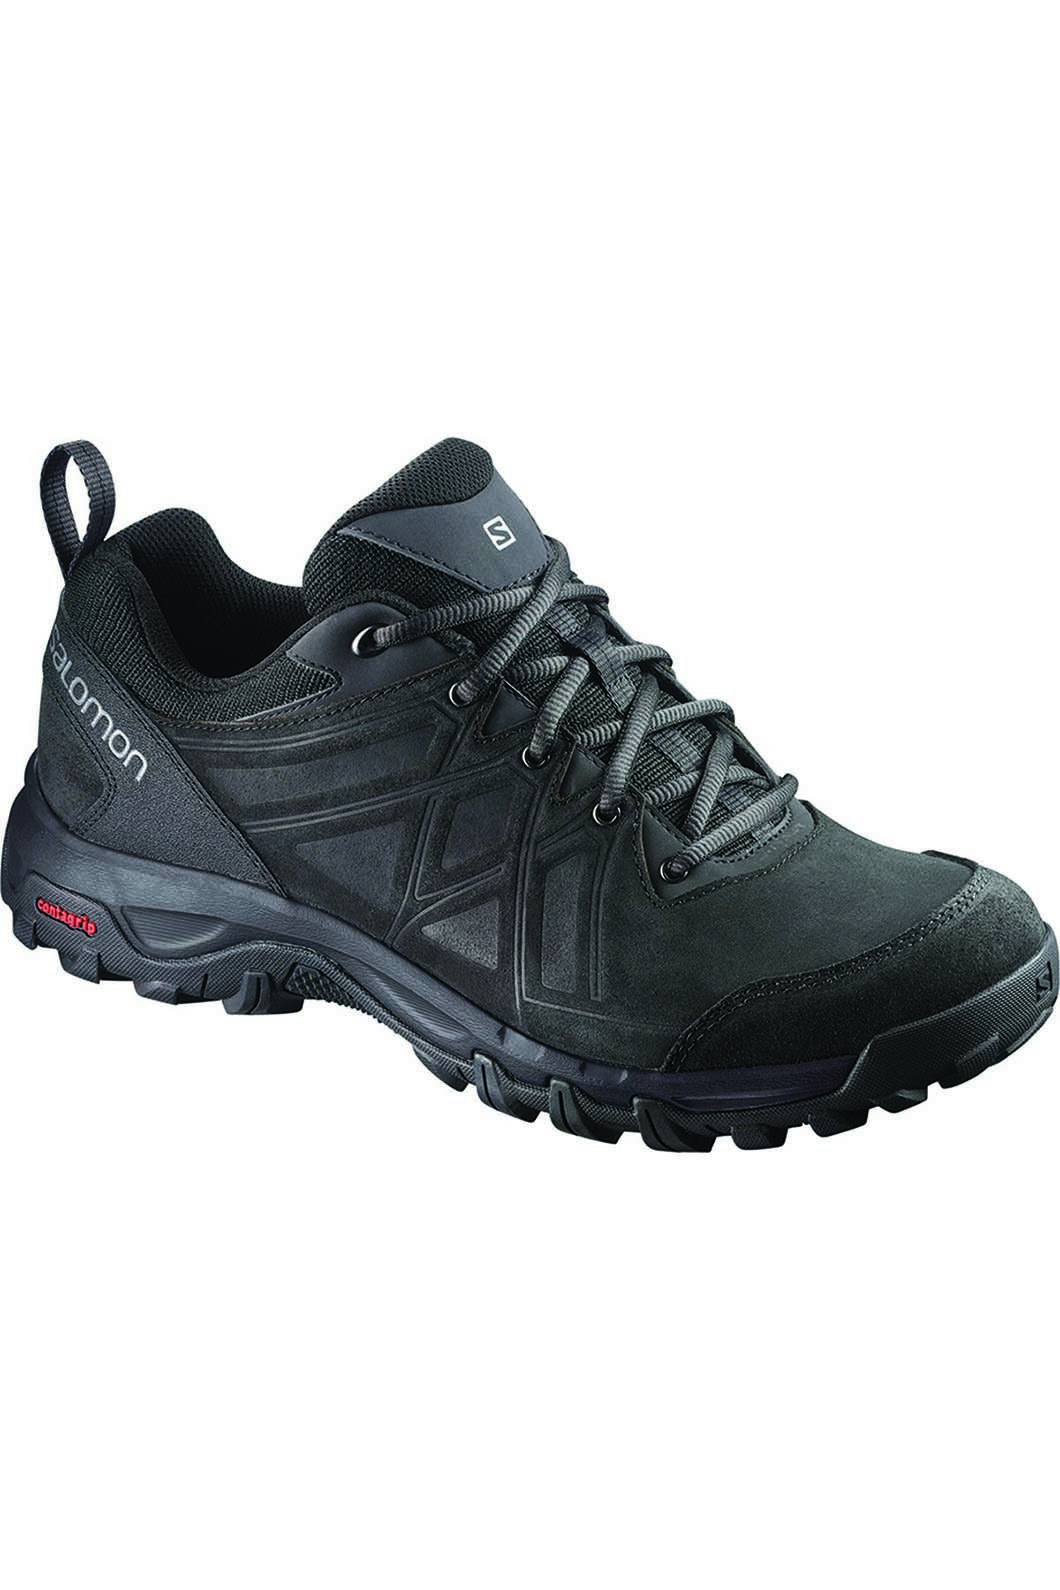 Salomon Men's Evasion 2 Hiking Boots Magnet, Black, hi-res